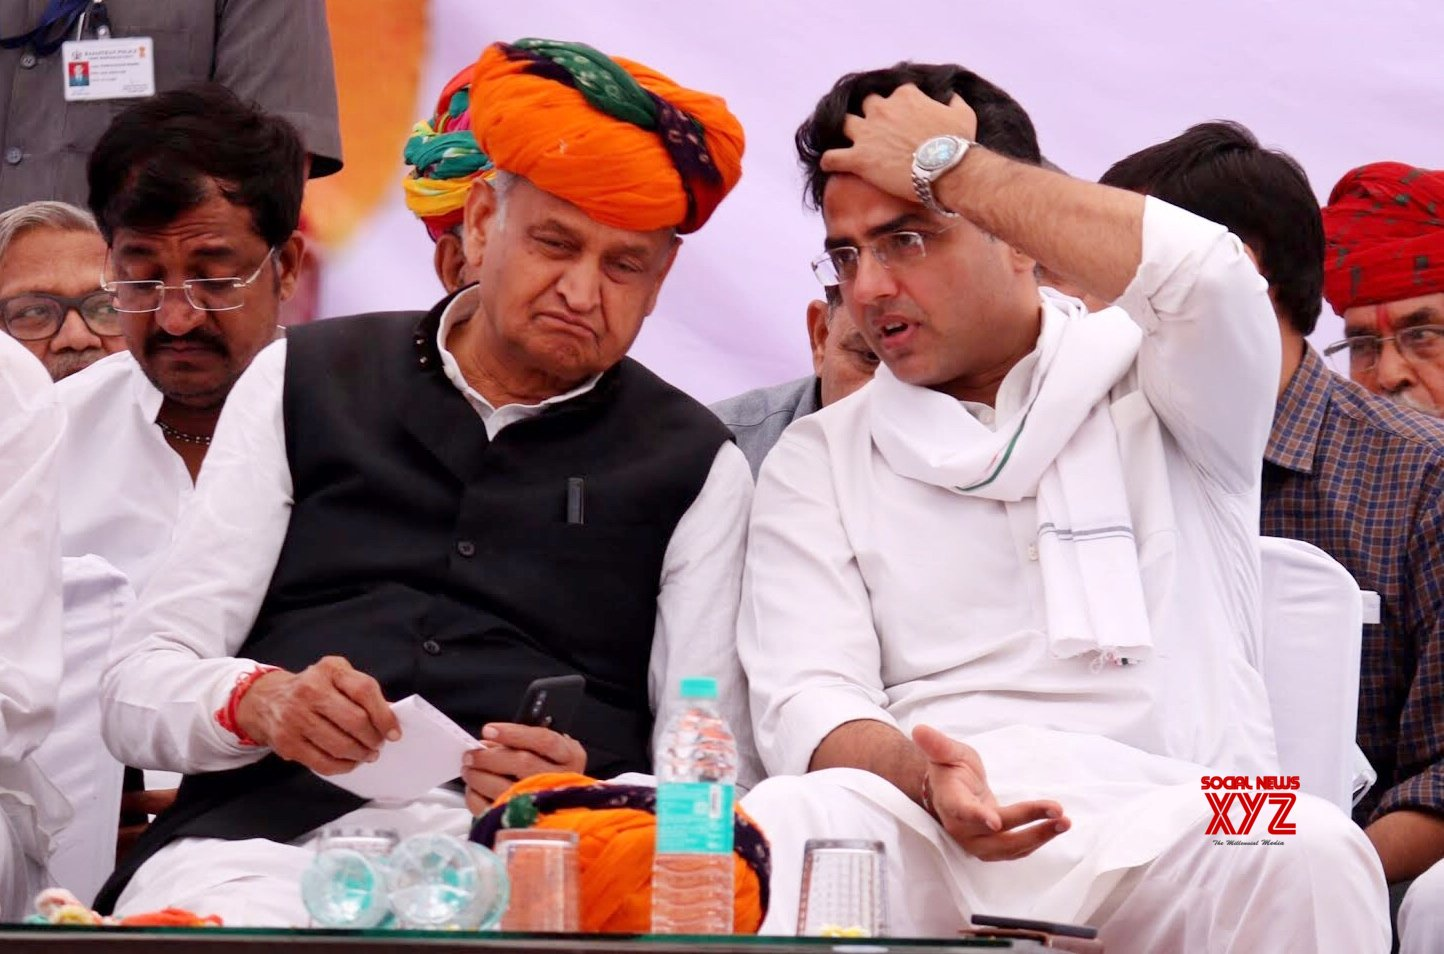 Ajmer: 2019 Lok Sabha polls - Ashok Gehlot, Sachin Pilot at a public rally #Gallery